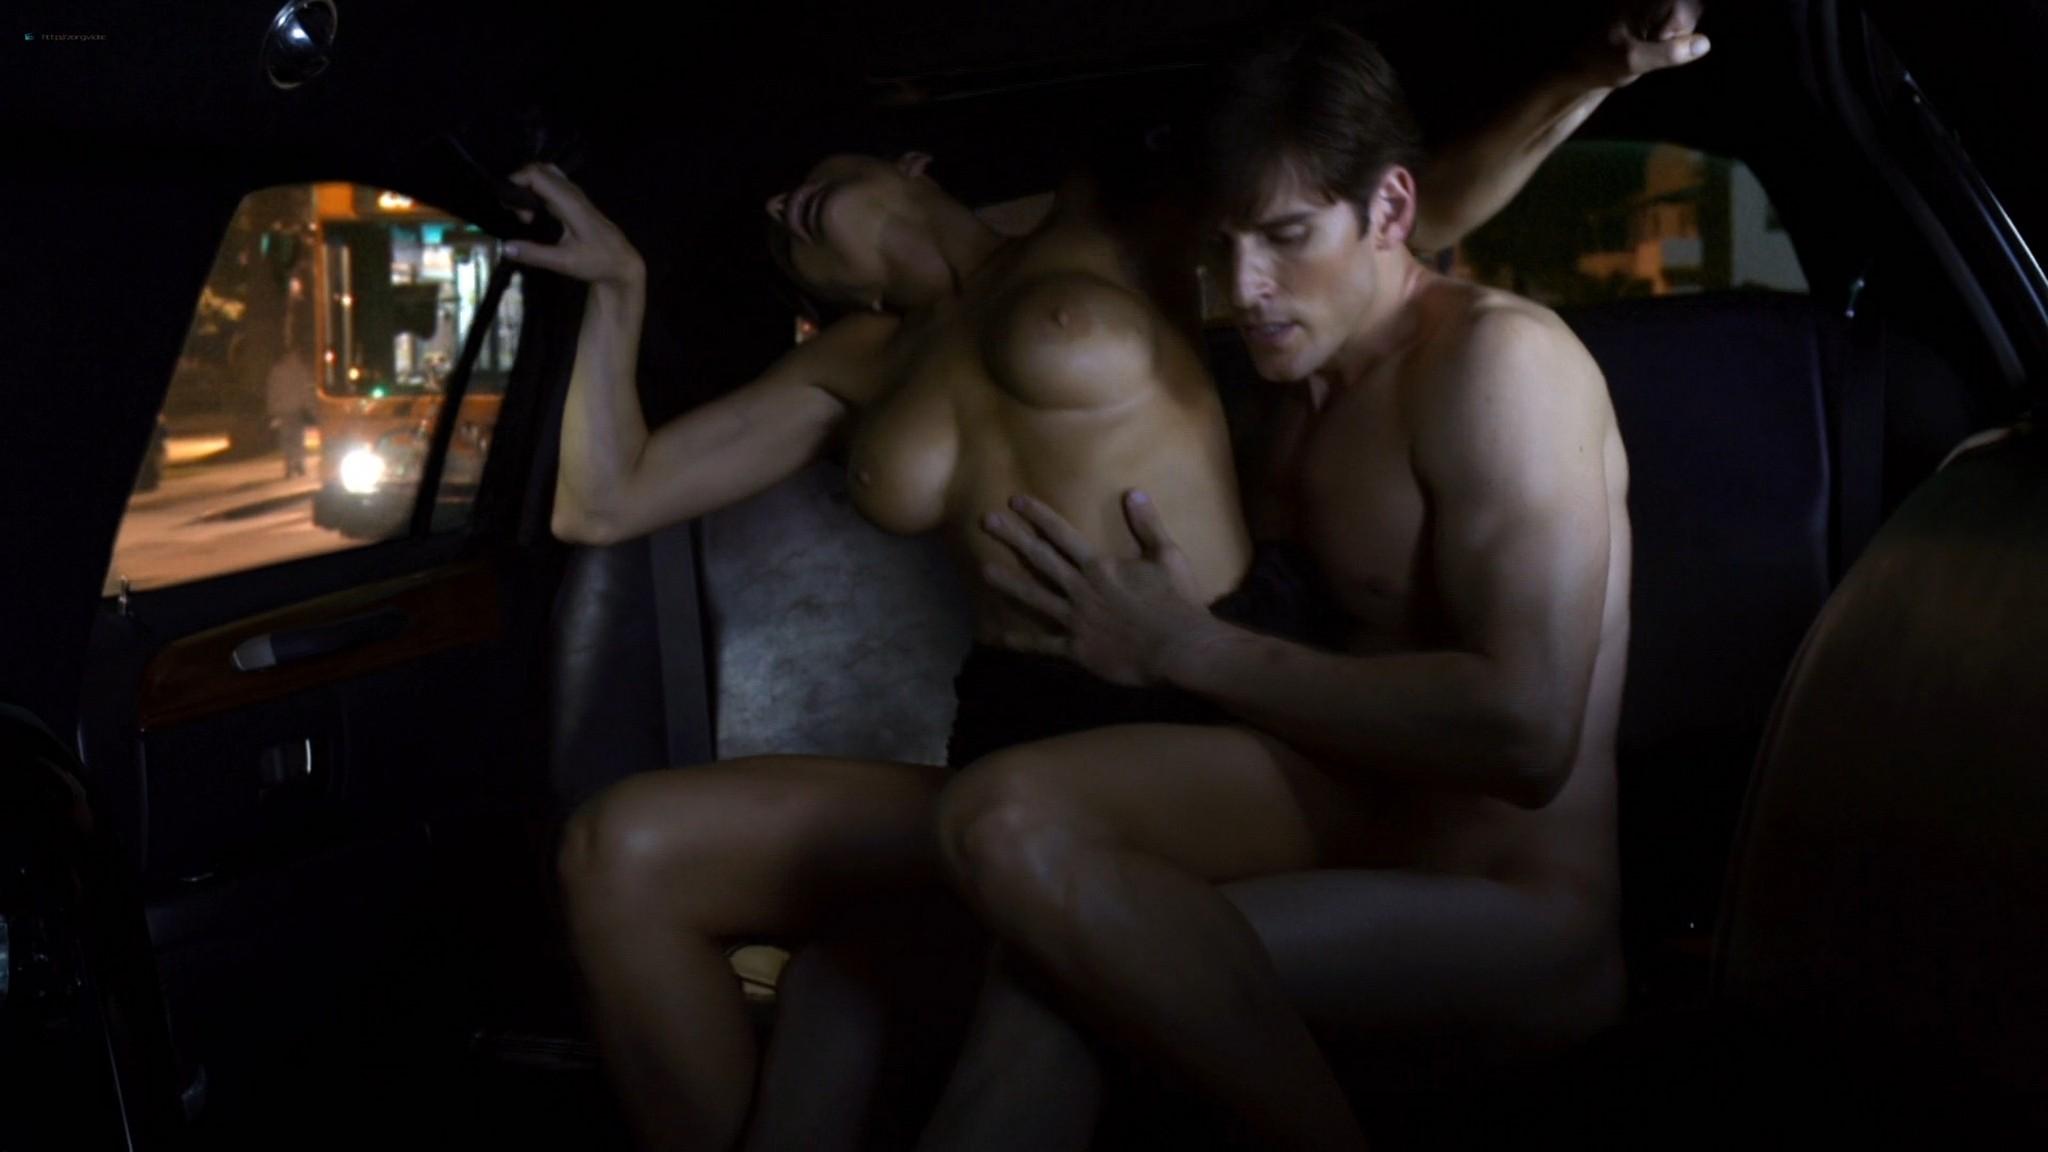 Ana Alexander nude sex Antonia Raftu sexy - Chemistry (2011) s1e10 HD 1080p (13)